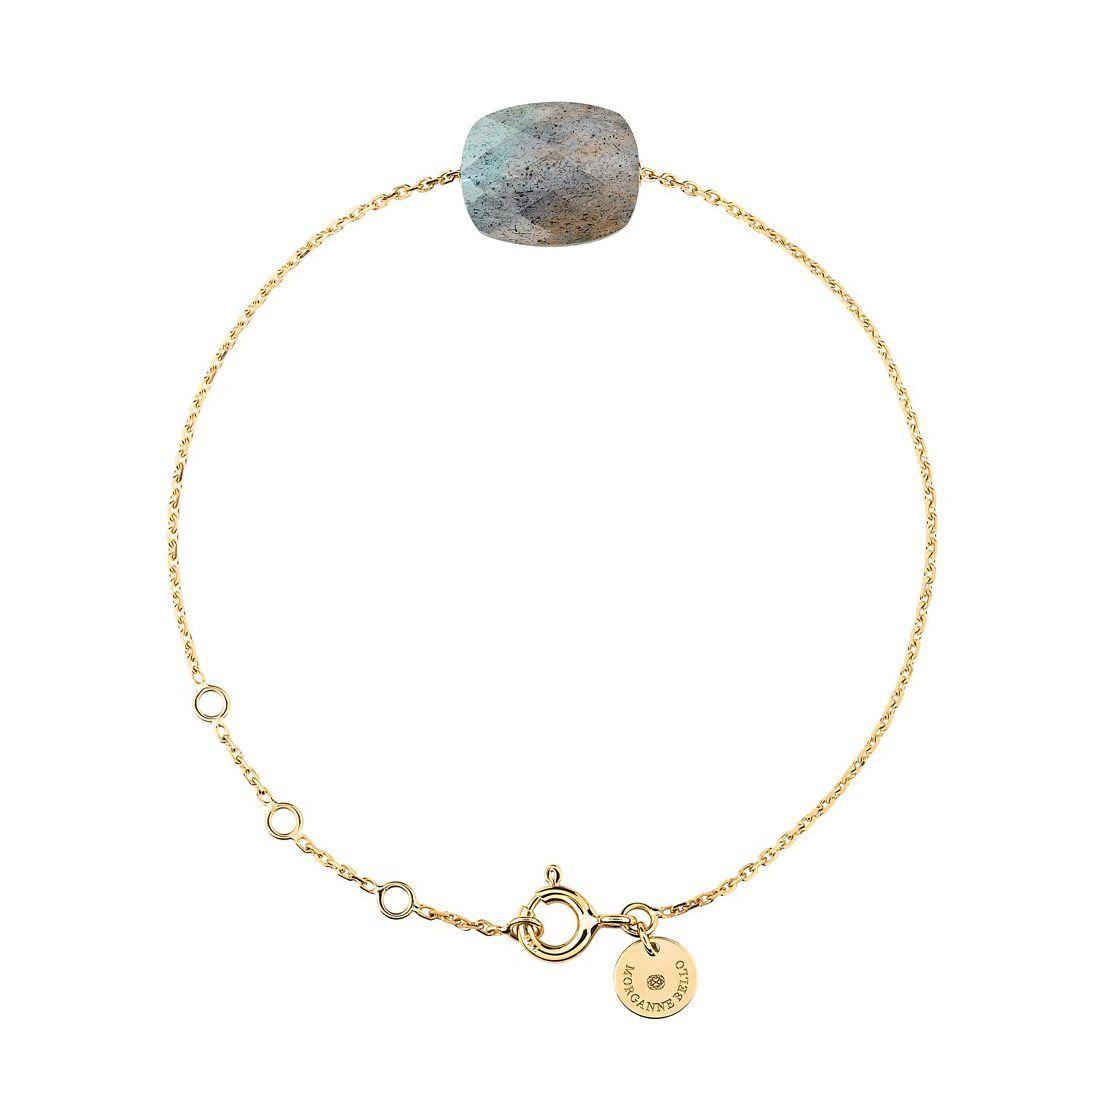 Bracelet Morganne Bello Friandise en or jaune et labradorite